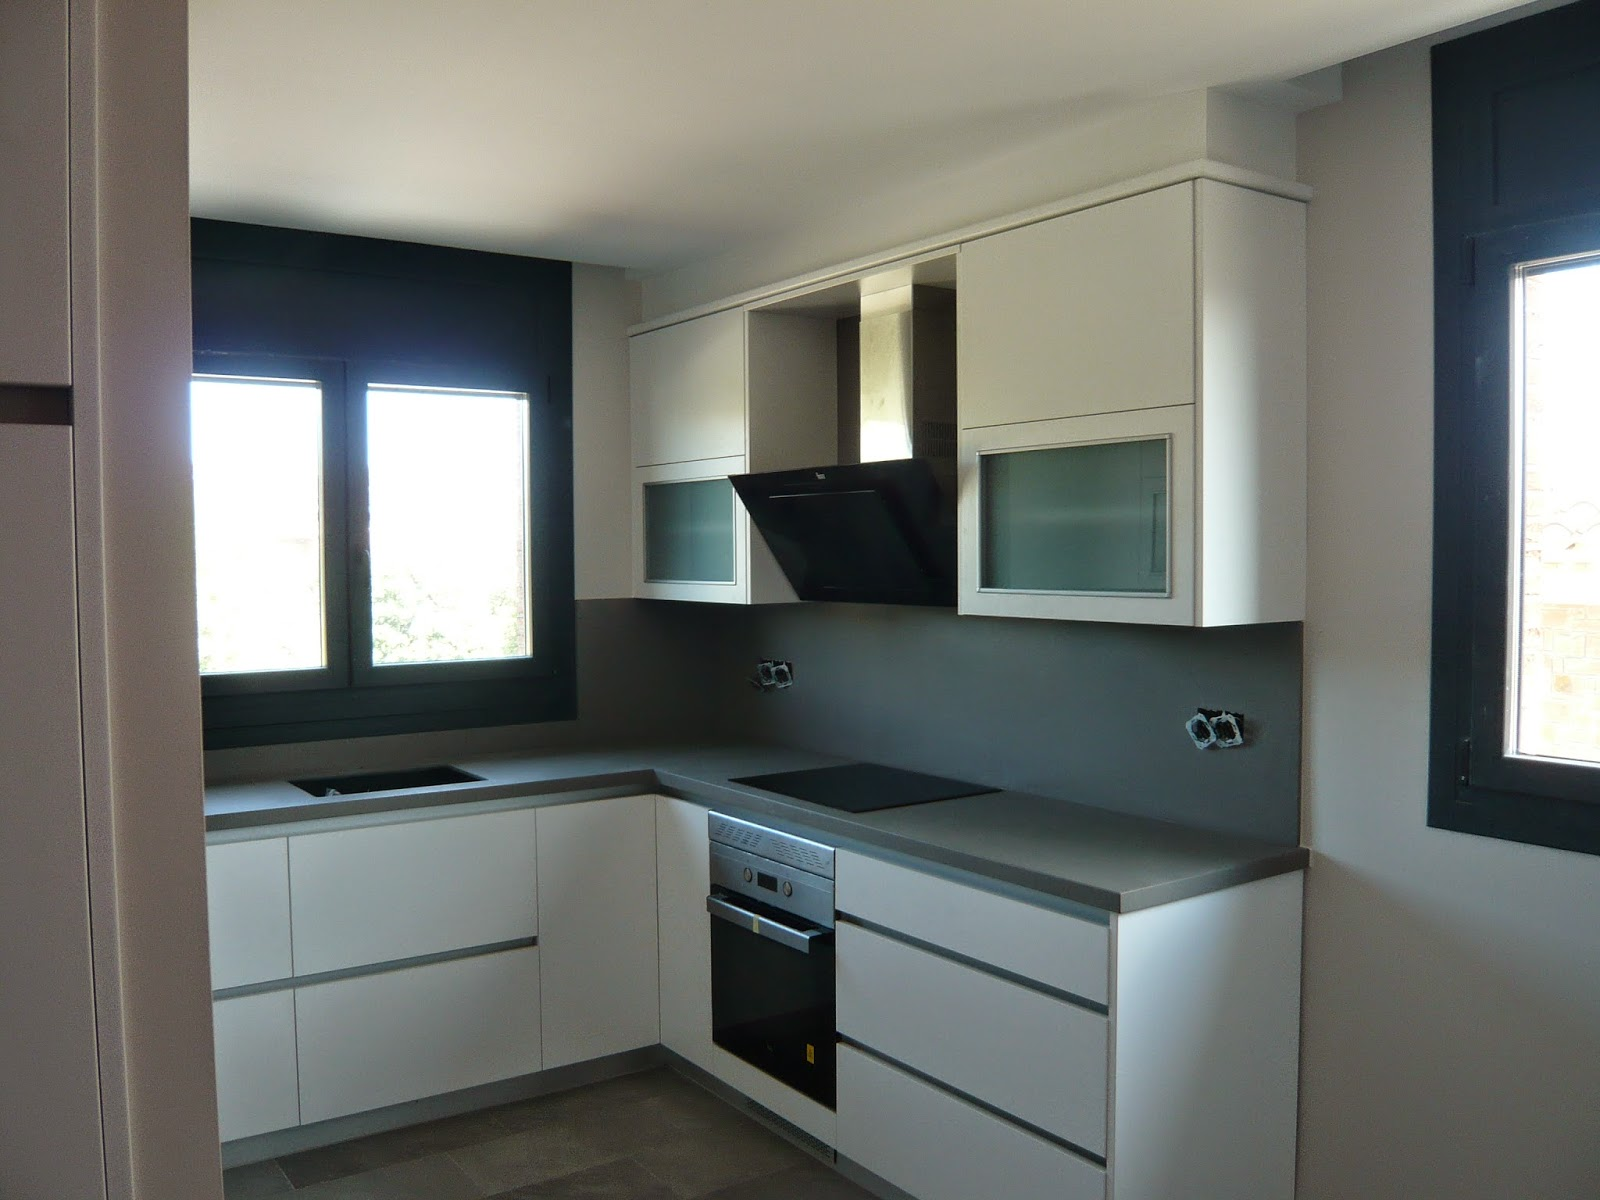 Reuscuina muebles de cocina formica blanca sin tiradores - Tiradores para muebles de cocina ...